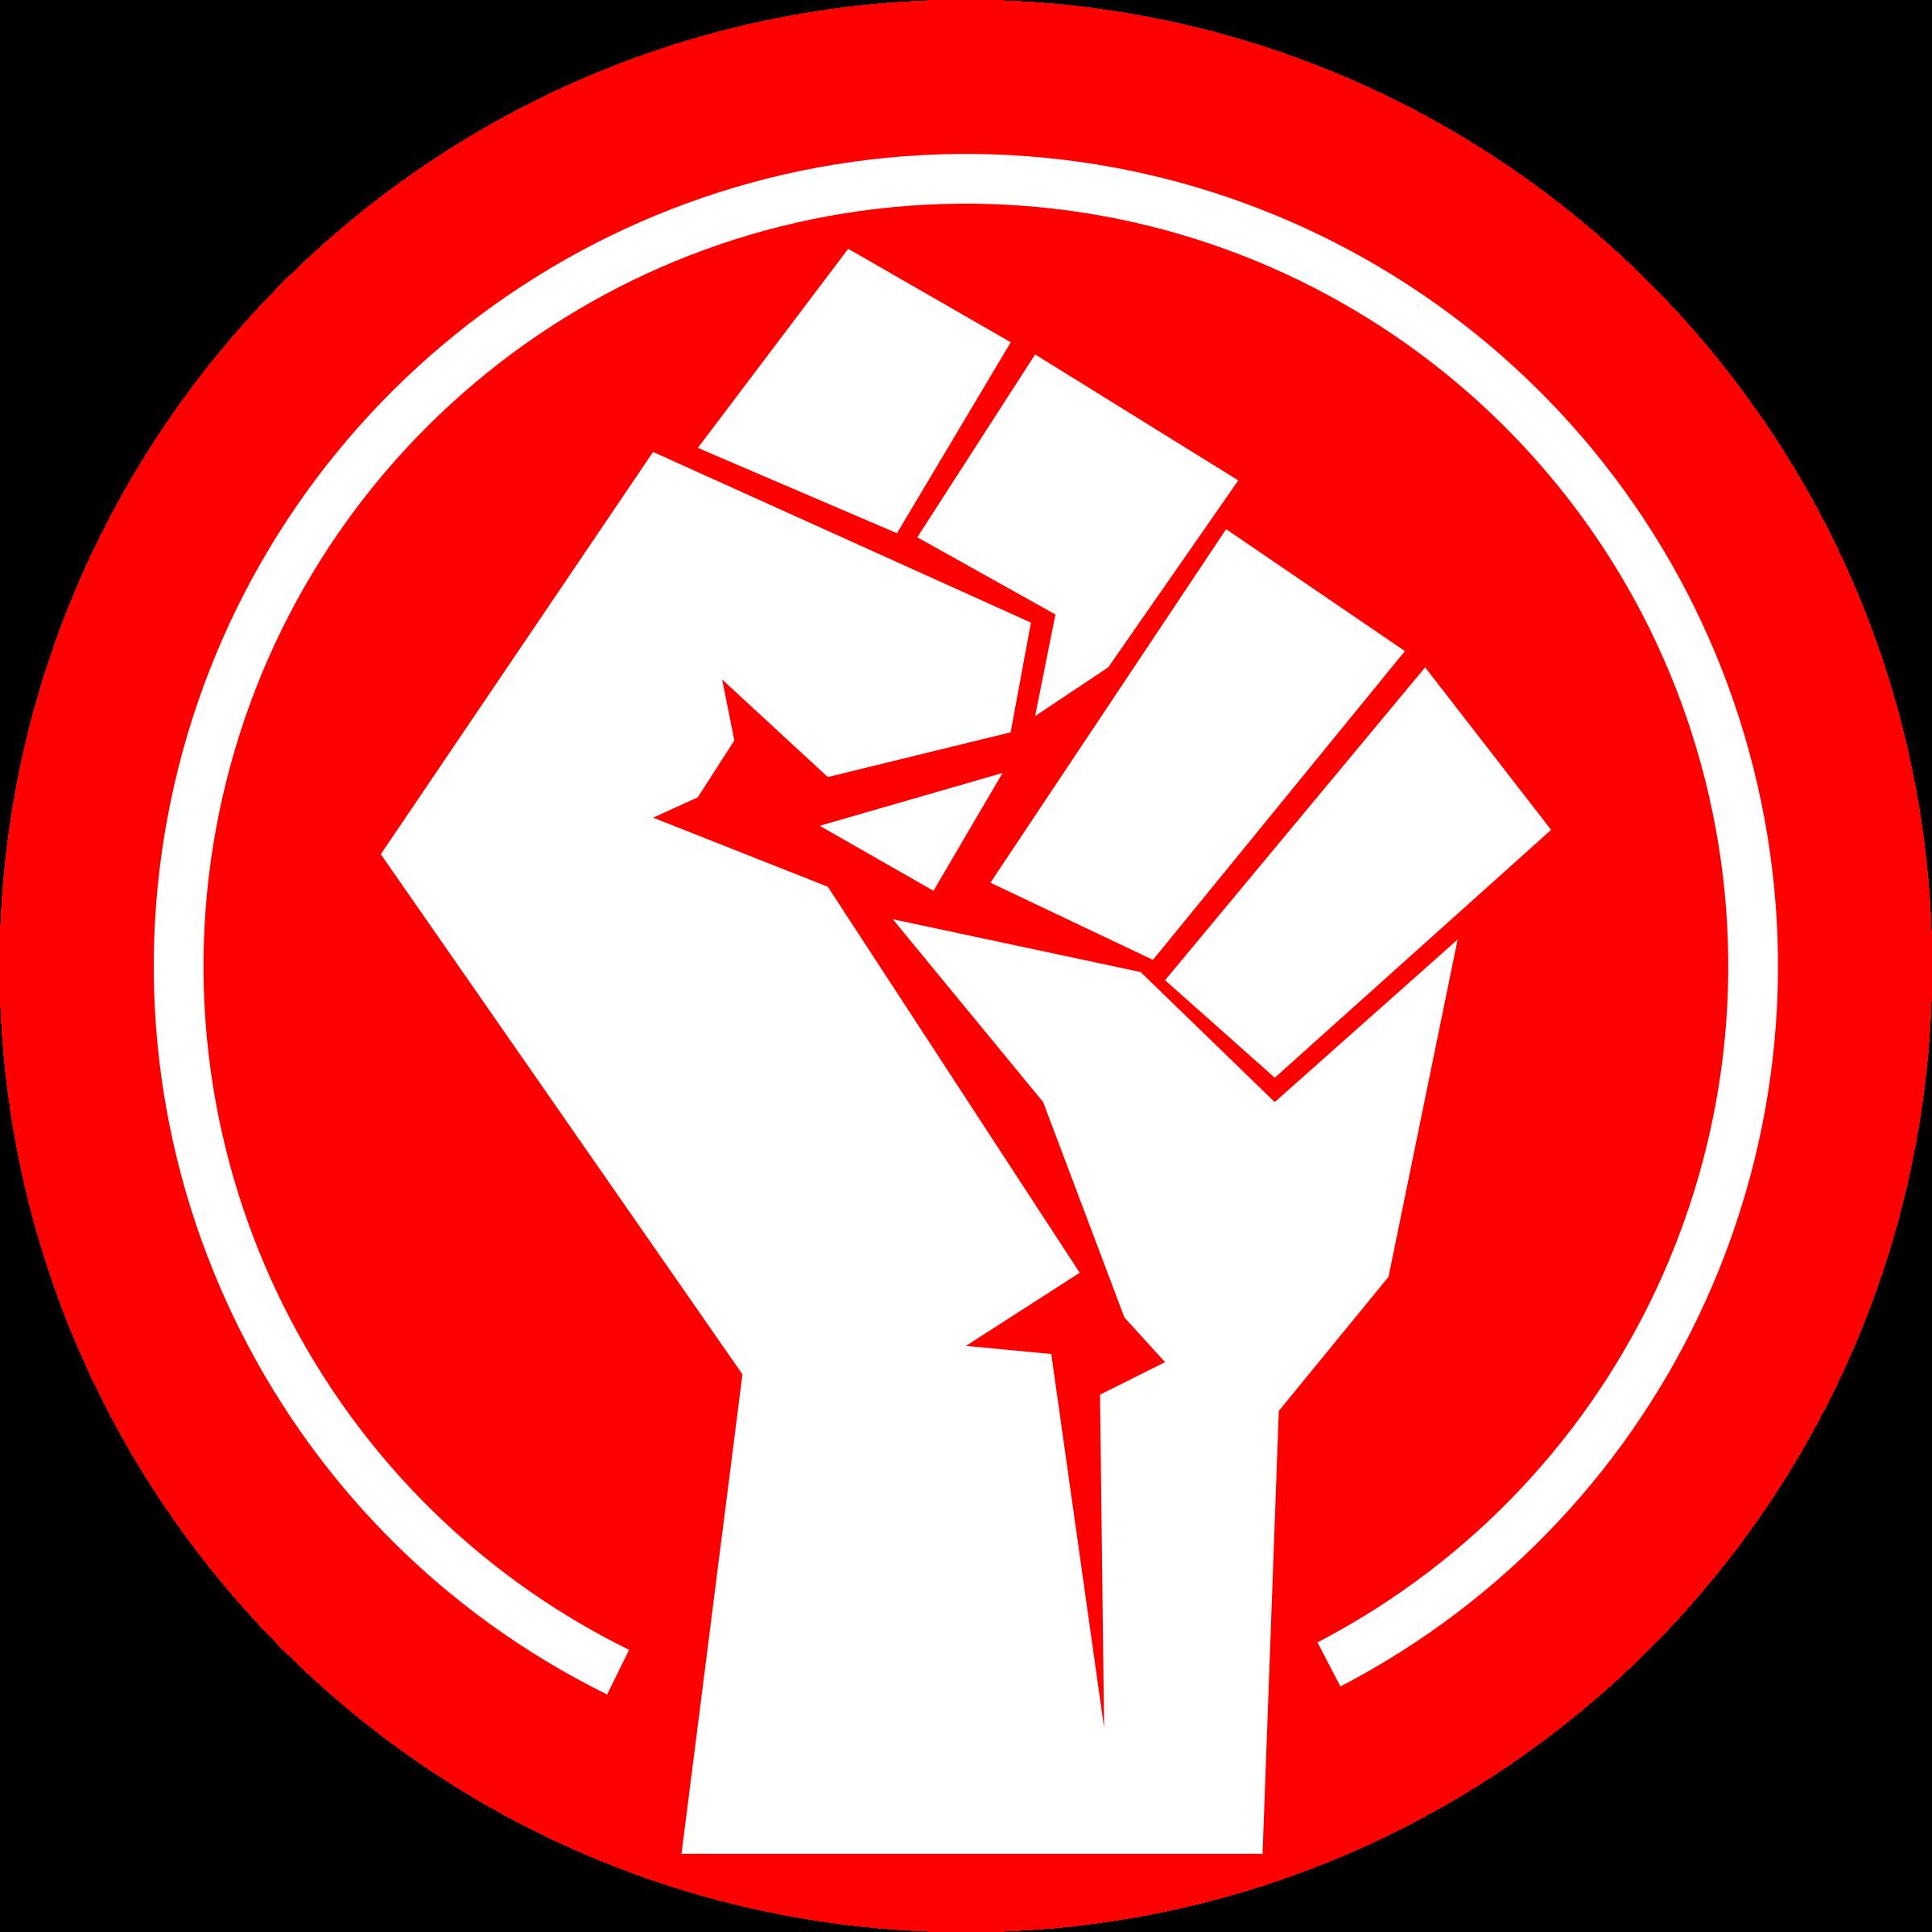 Logo by eternaltyro remixed. Fist clipart raised fist